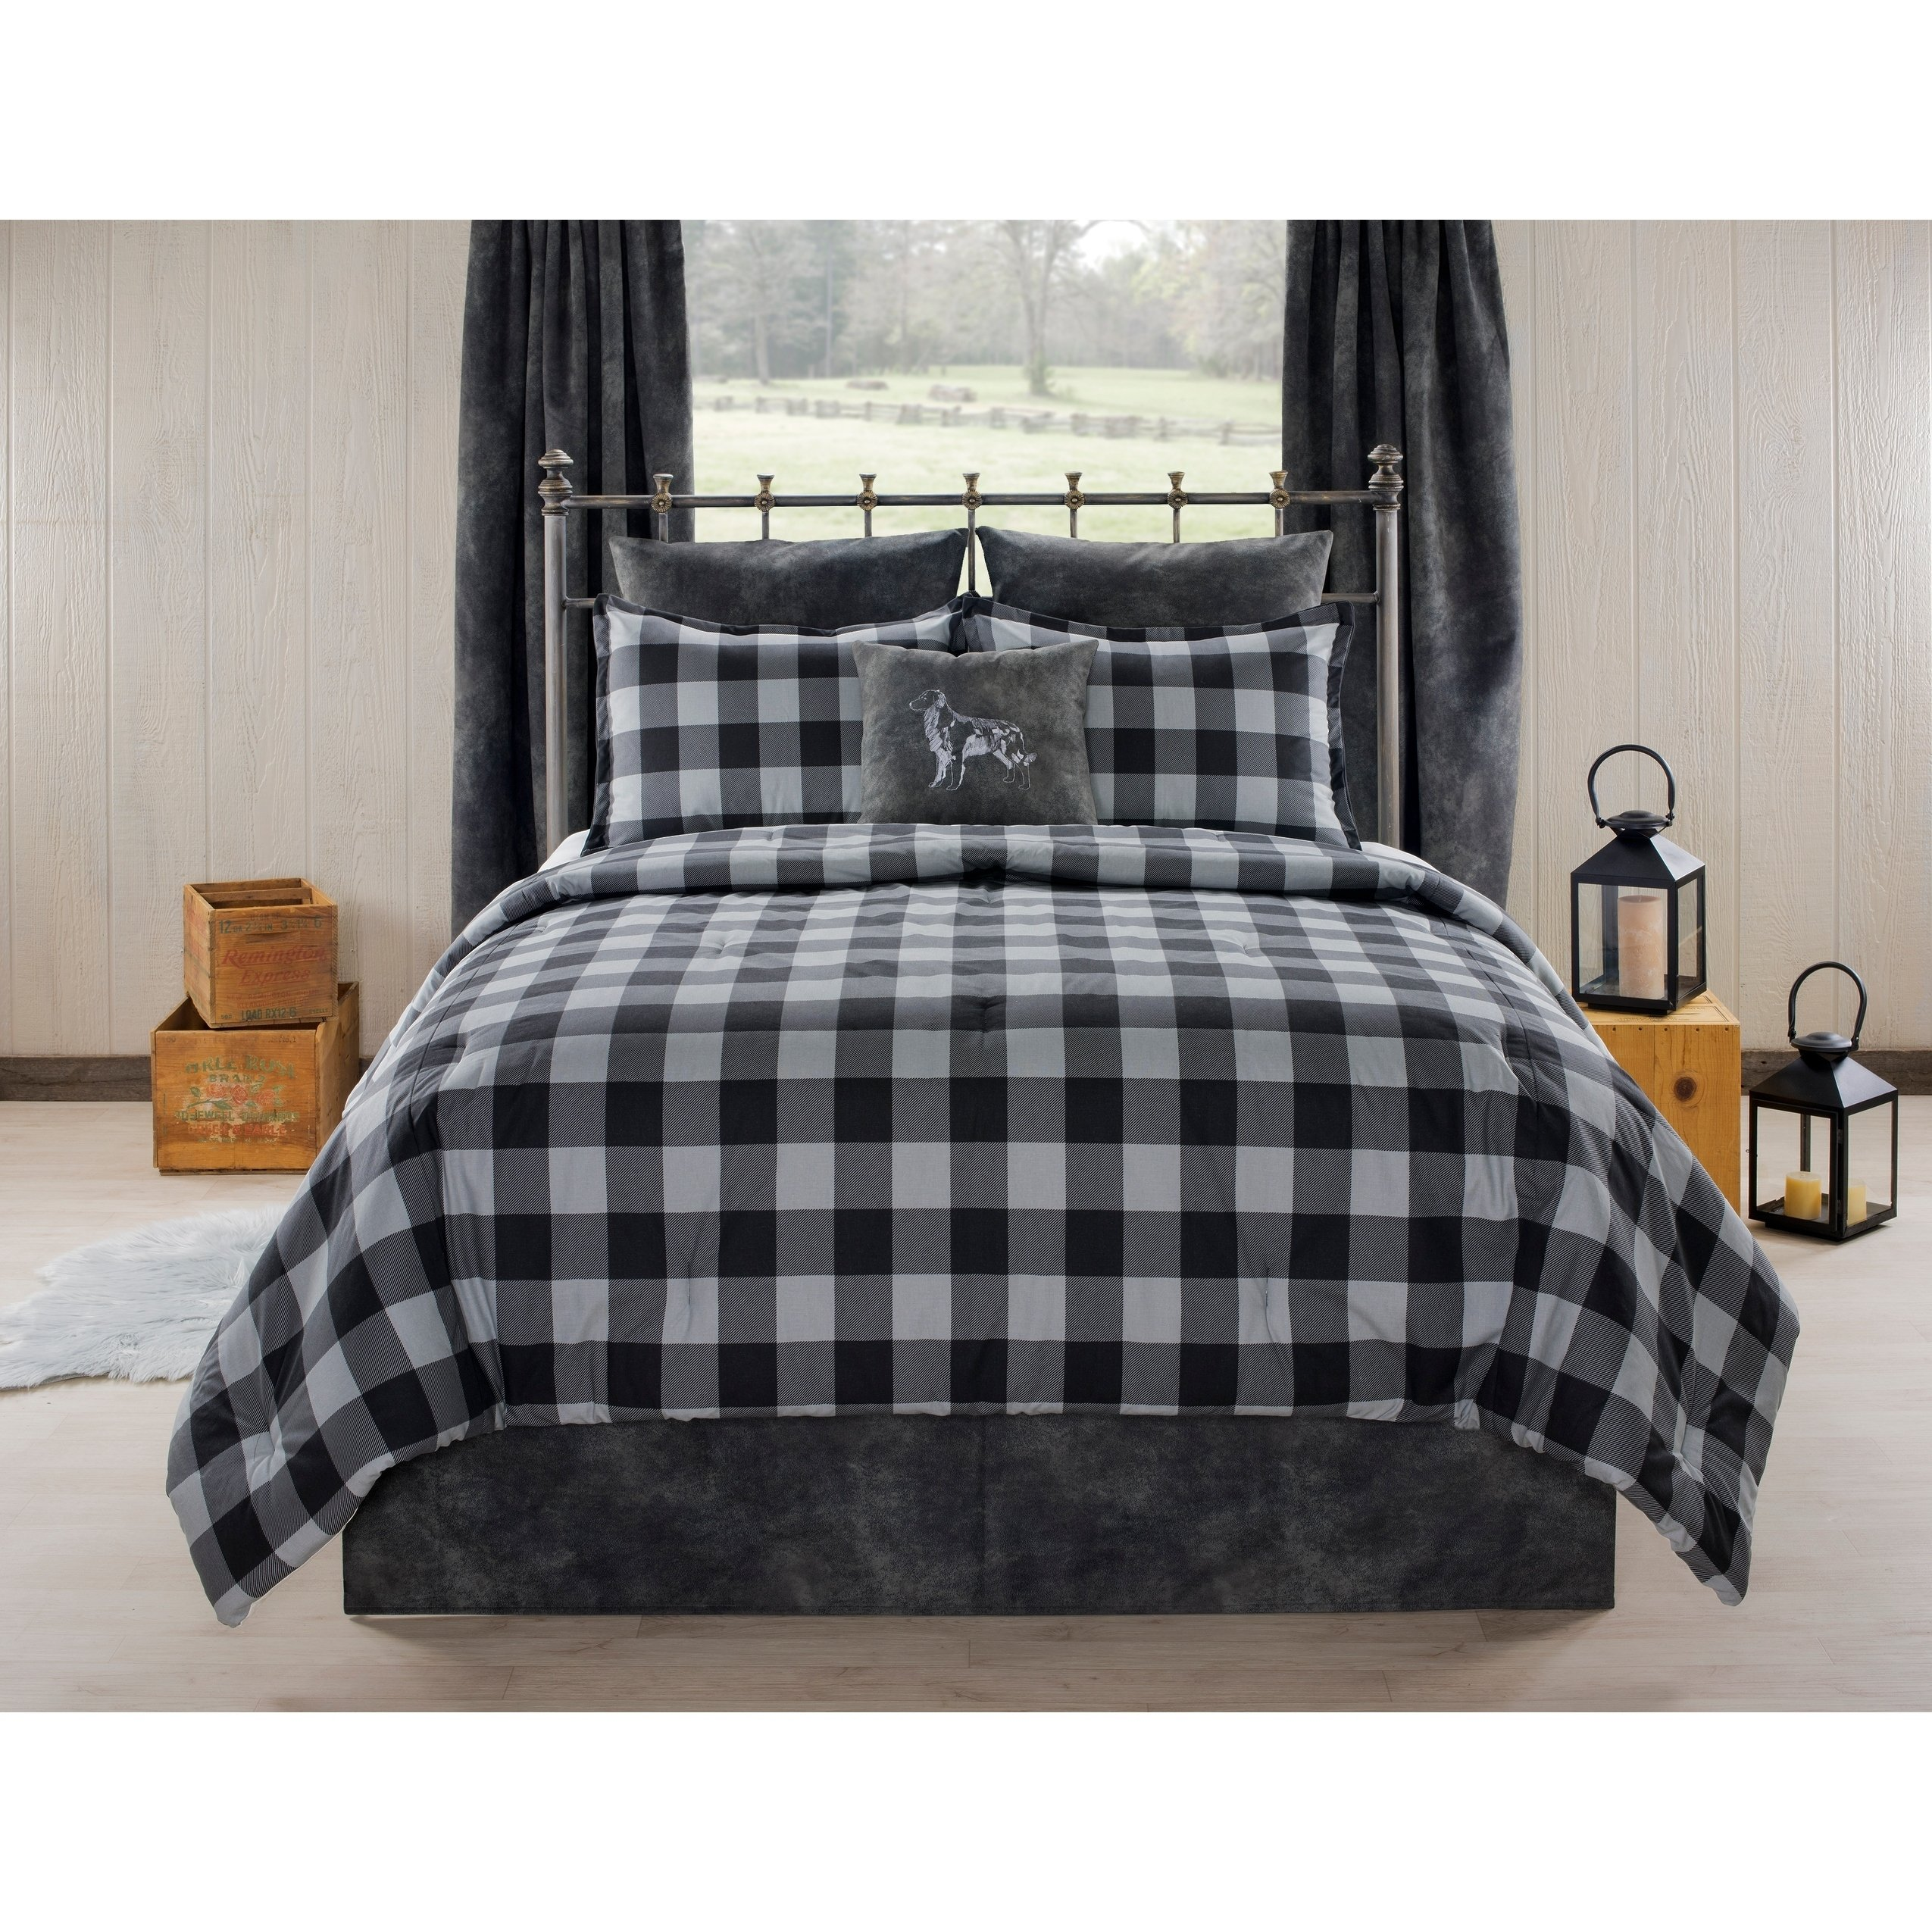 Aspen Cabin And Lodge Gray Plaid Comforter Set Queen 4 Piece